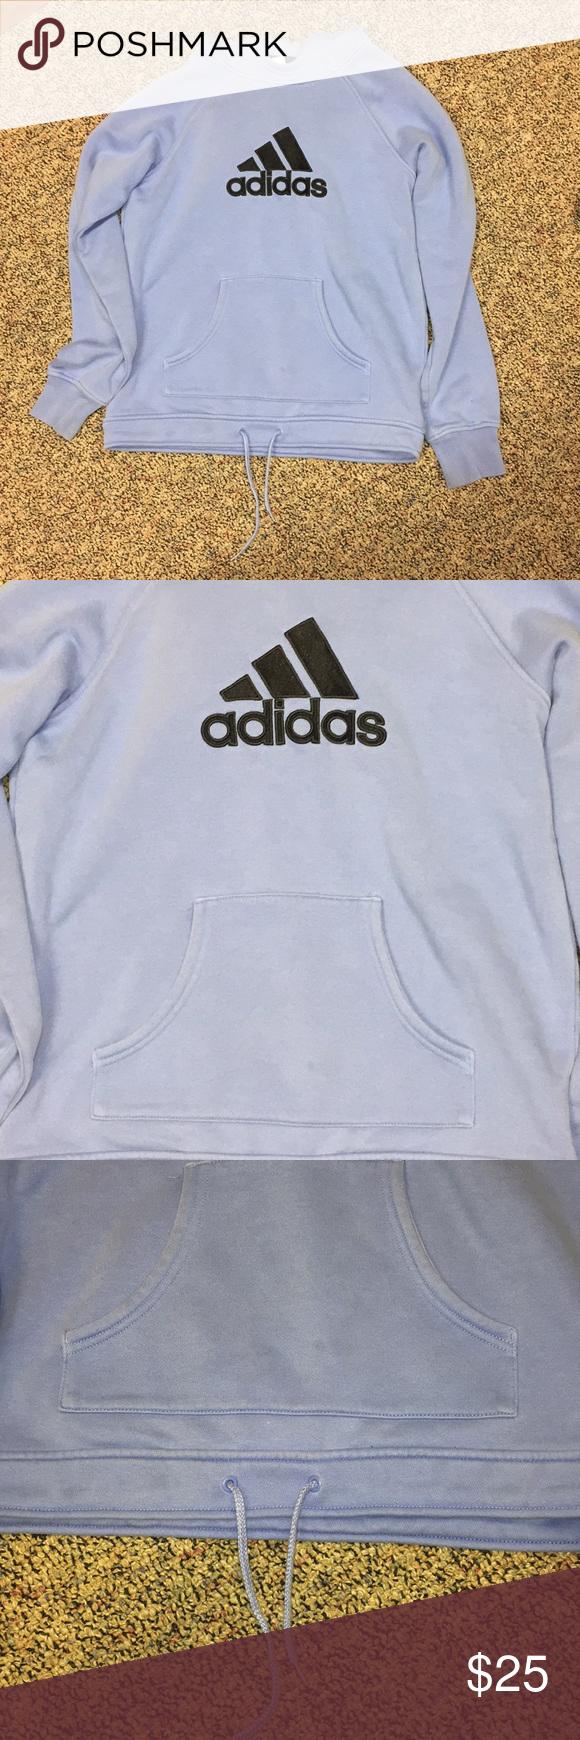 Small Baby Blue Adidas Sweatshirt Adidas Sweatshirt Blue Adidas Long Sleeve Tshirt Men [ 1740 x 580 Pixel ]